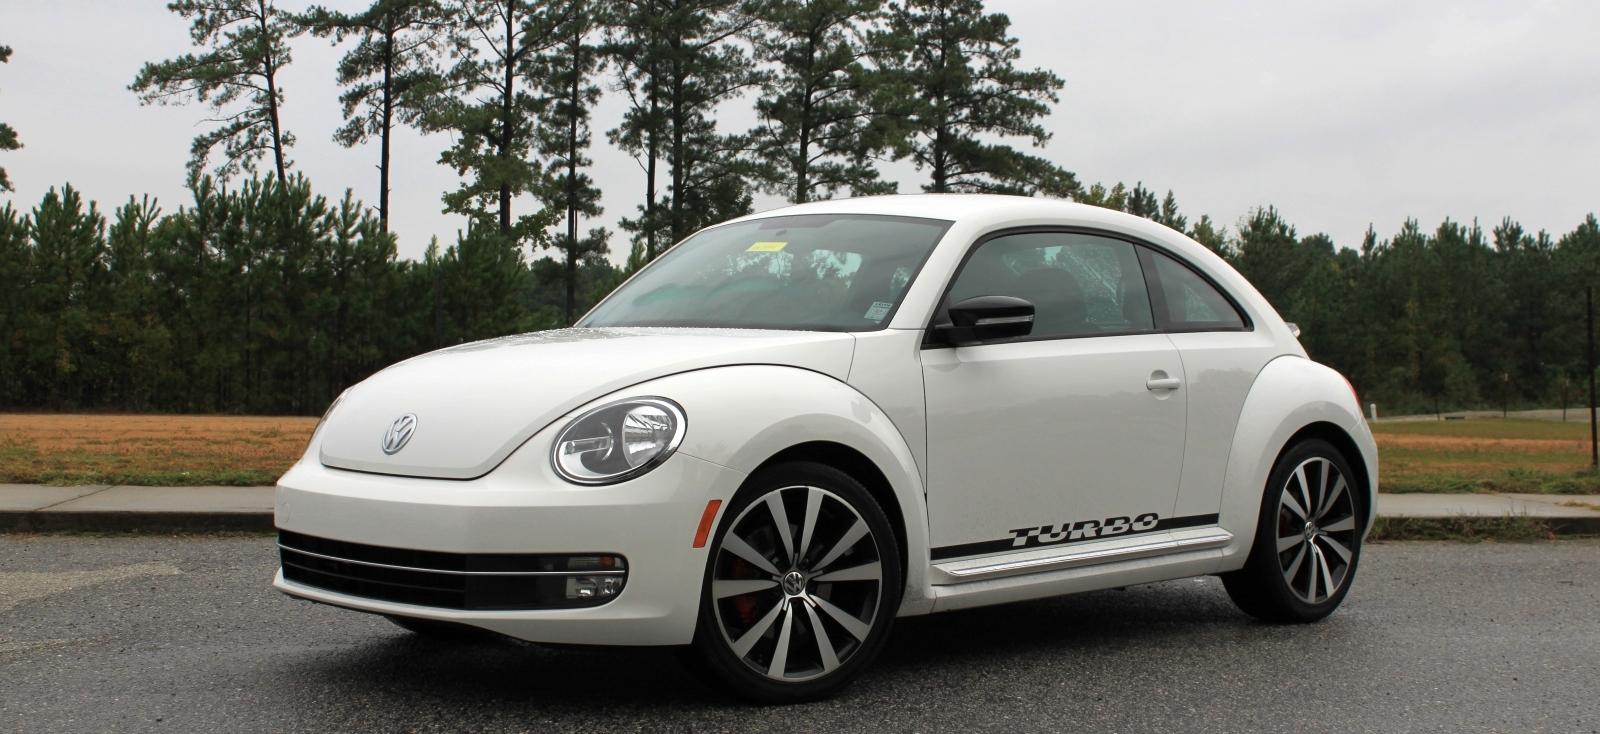 Vw Beetle Test >> 2012 Volkswagen Beetle Turbo Test Drive